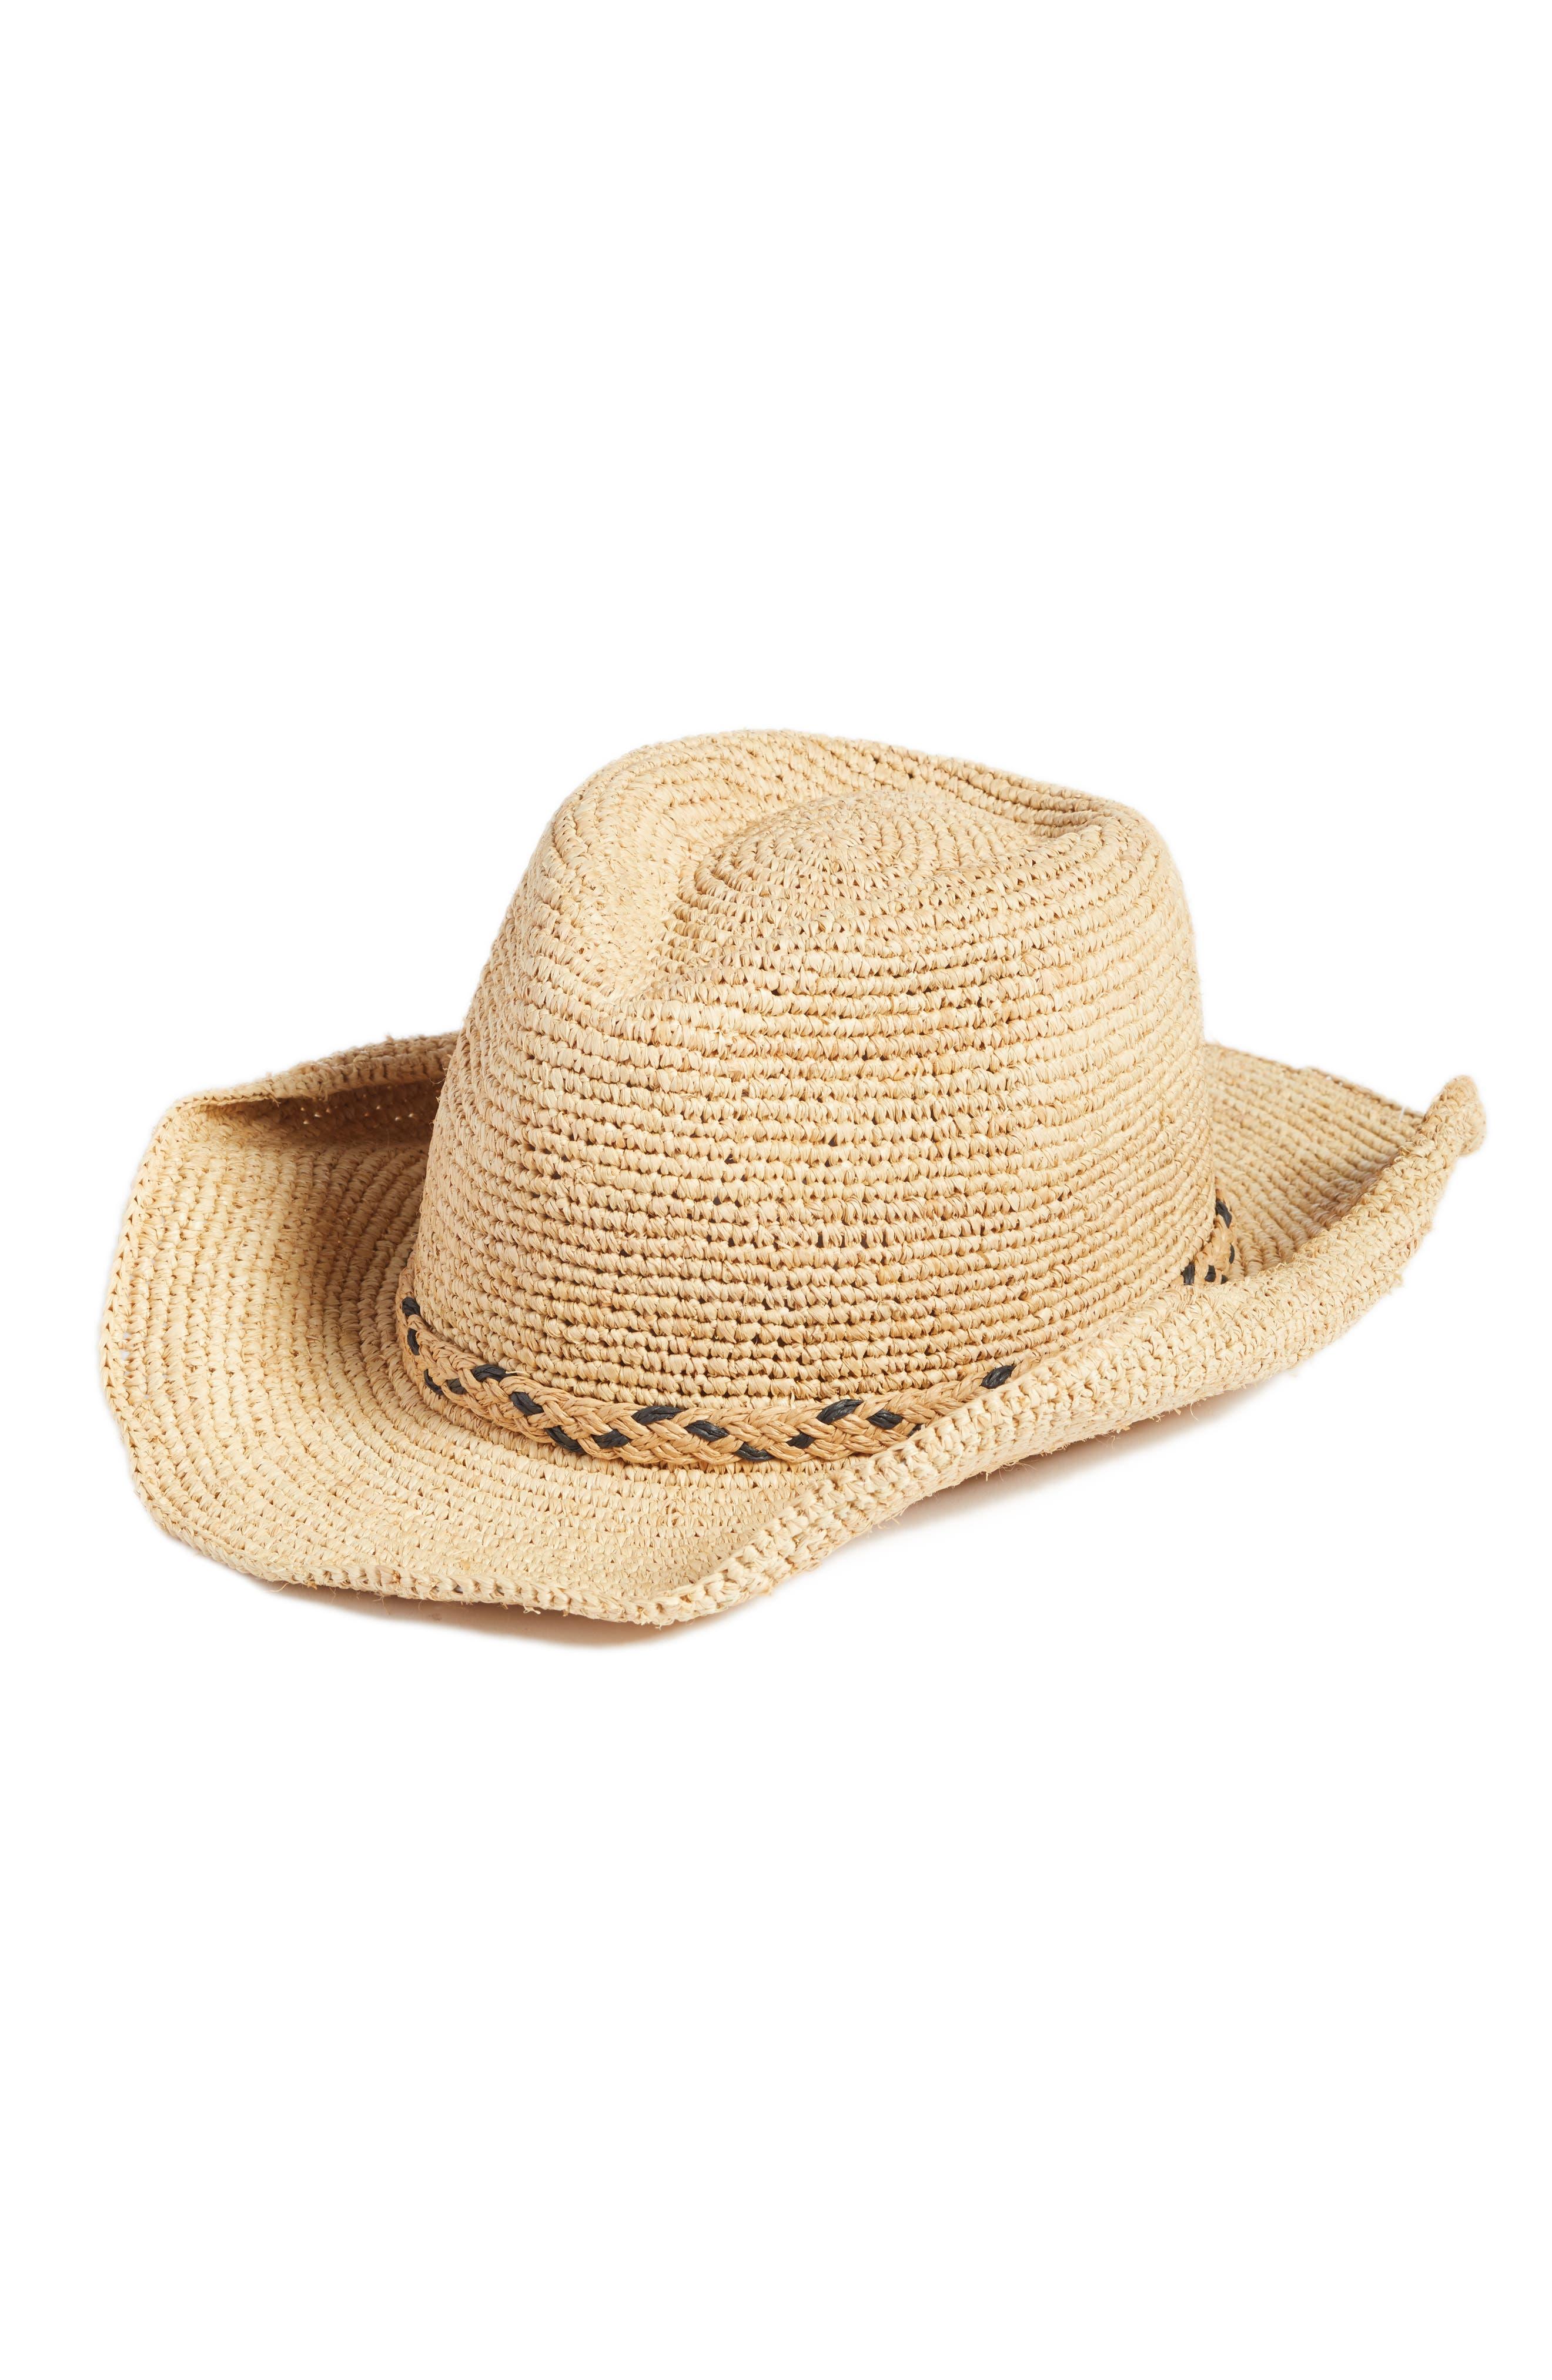 Packable Raffia Panama Hat,                             Main thumbnail 1, color,                             Natural